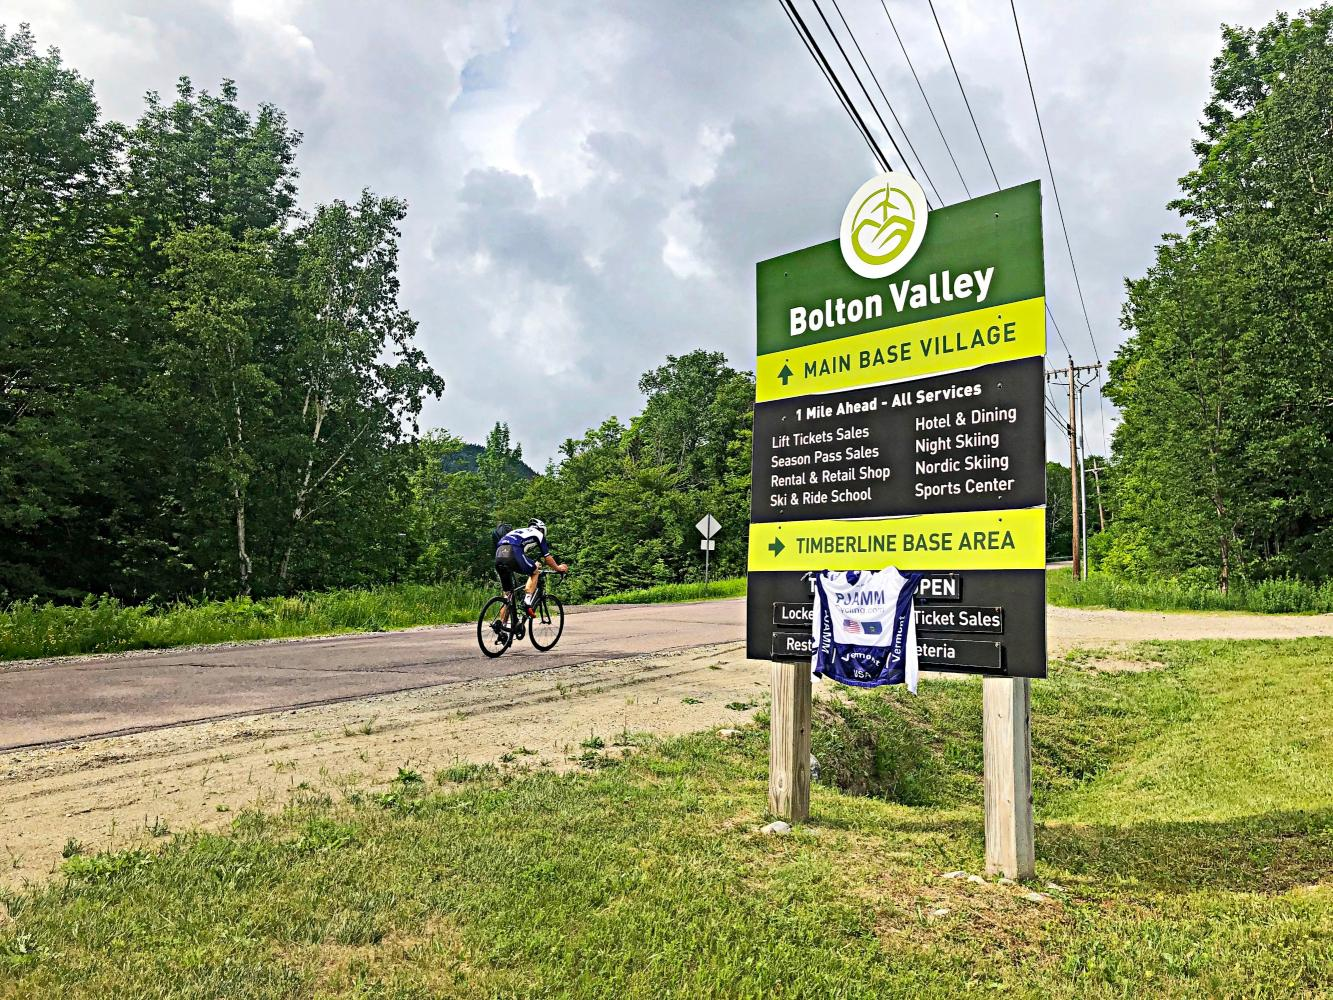 Bolton Valley Road Bike Climb - PJAMM Cycling